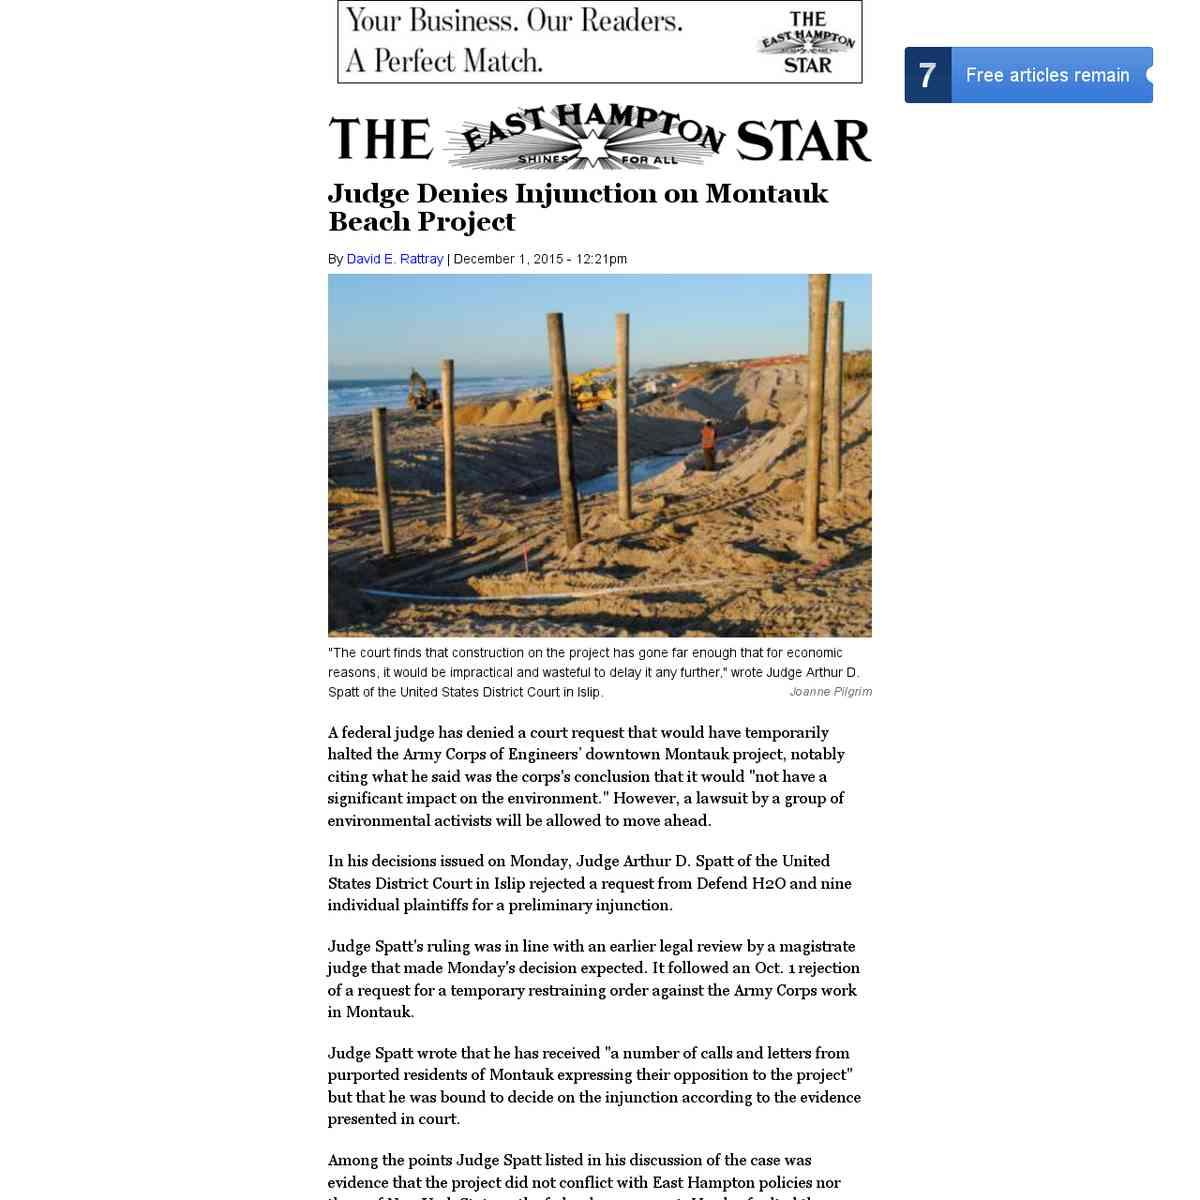 Judge Denies Injunction on Montauk Beach Project